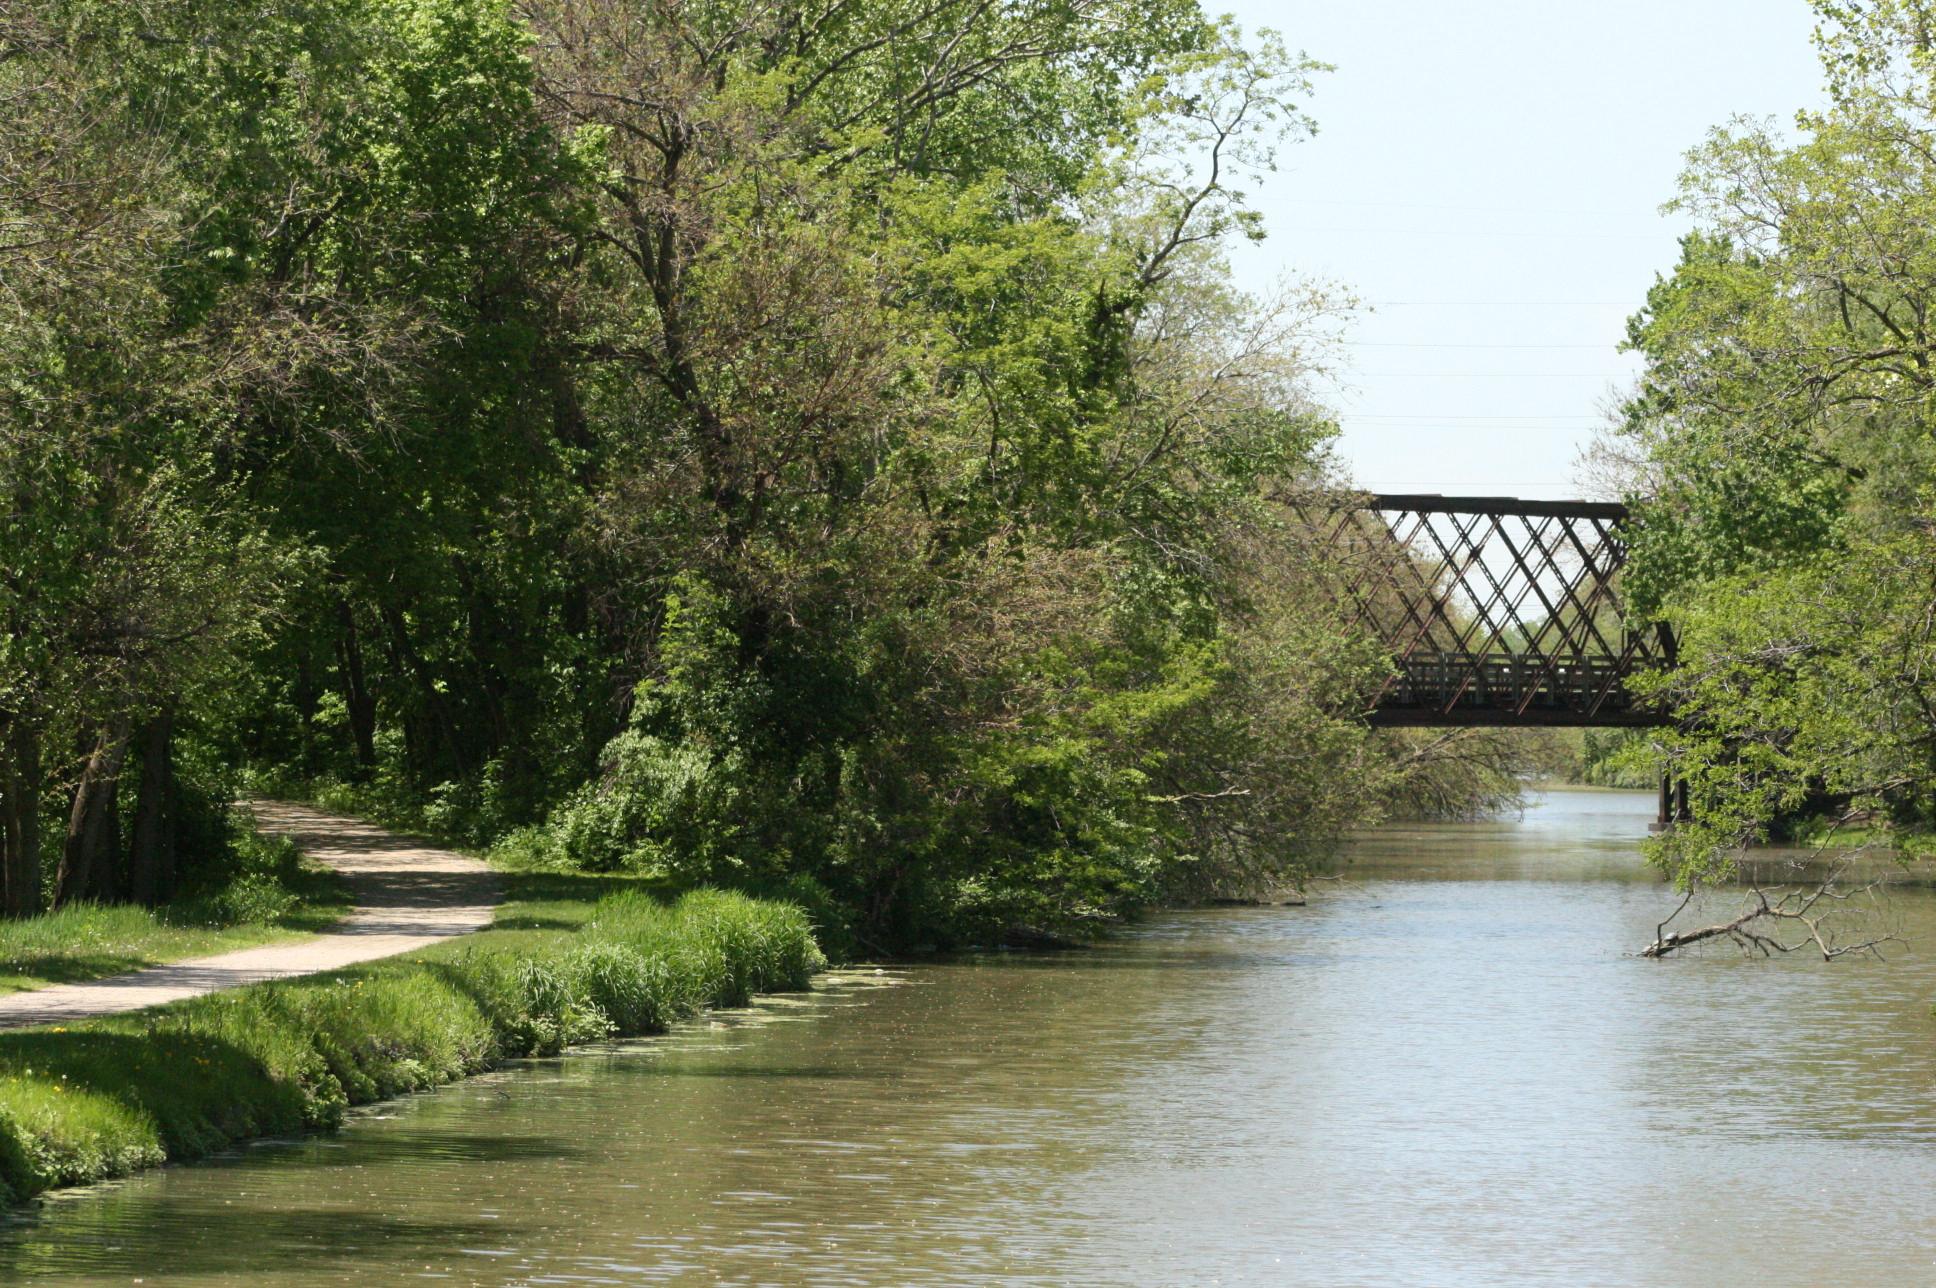 I Amp M Canal State Trail Enjoy Illinois